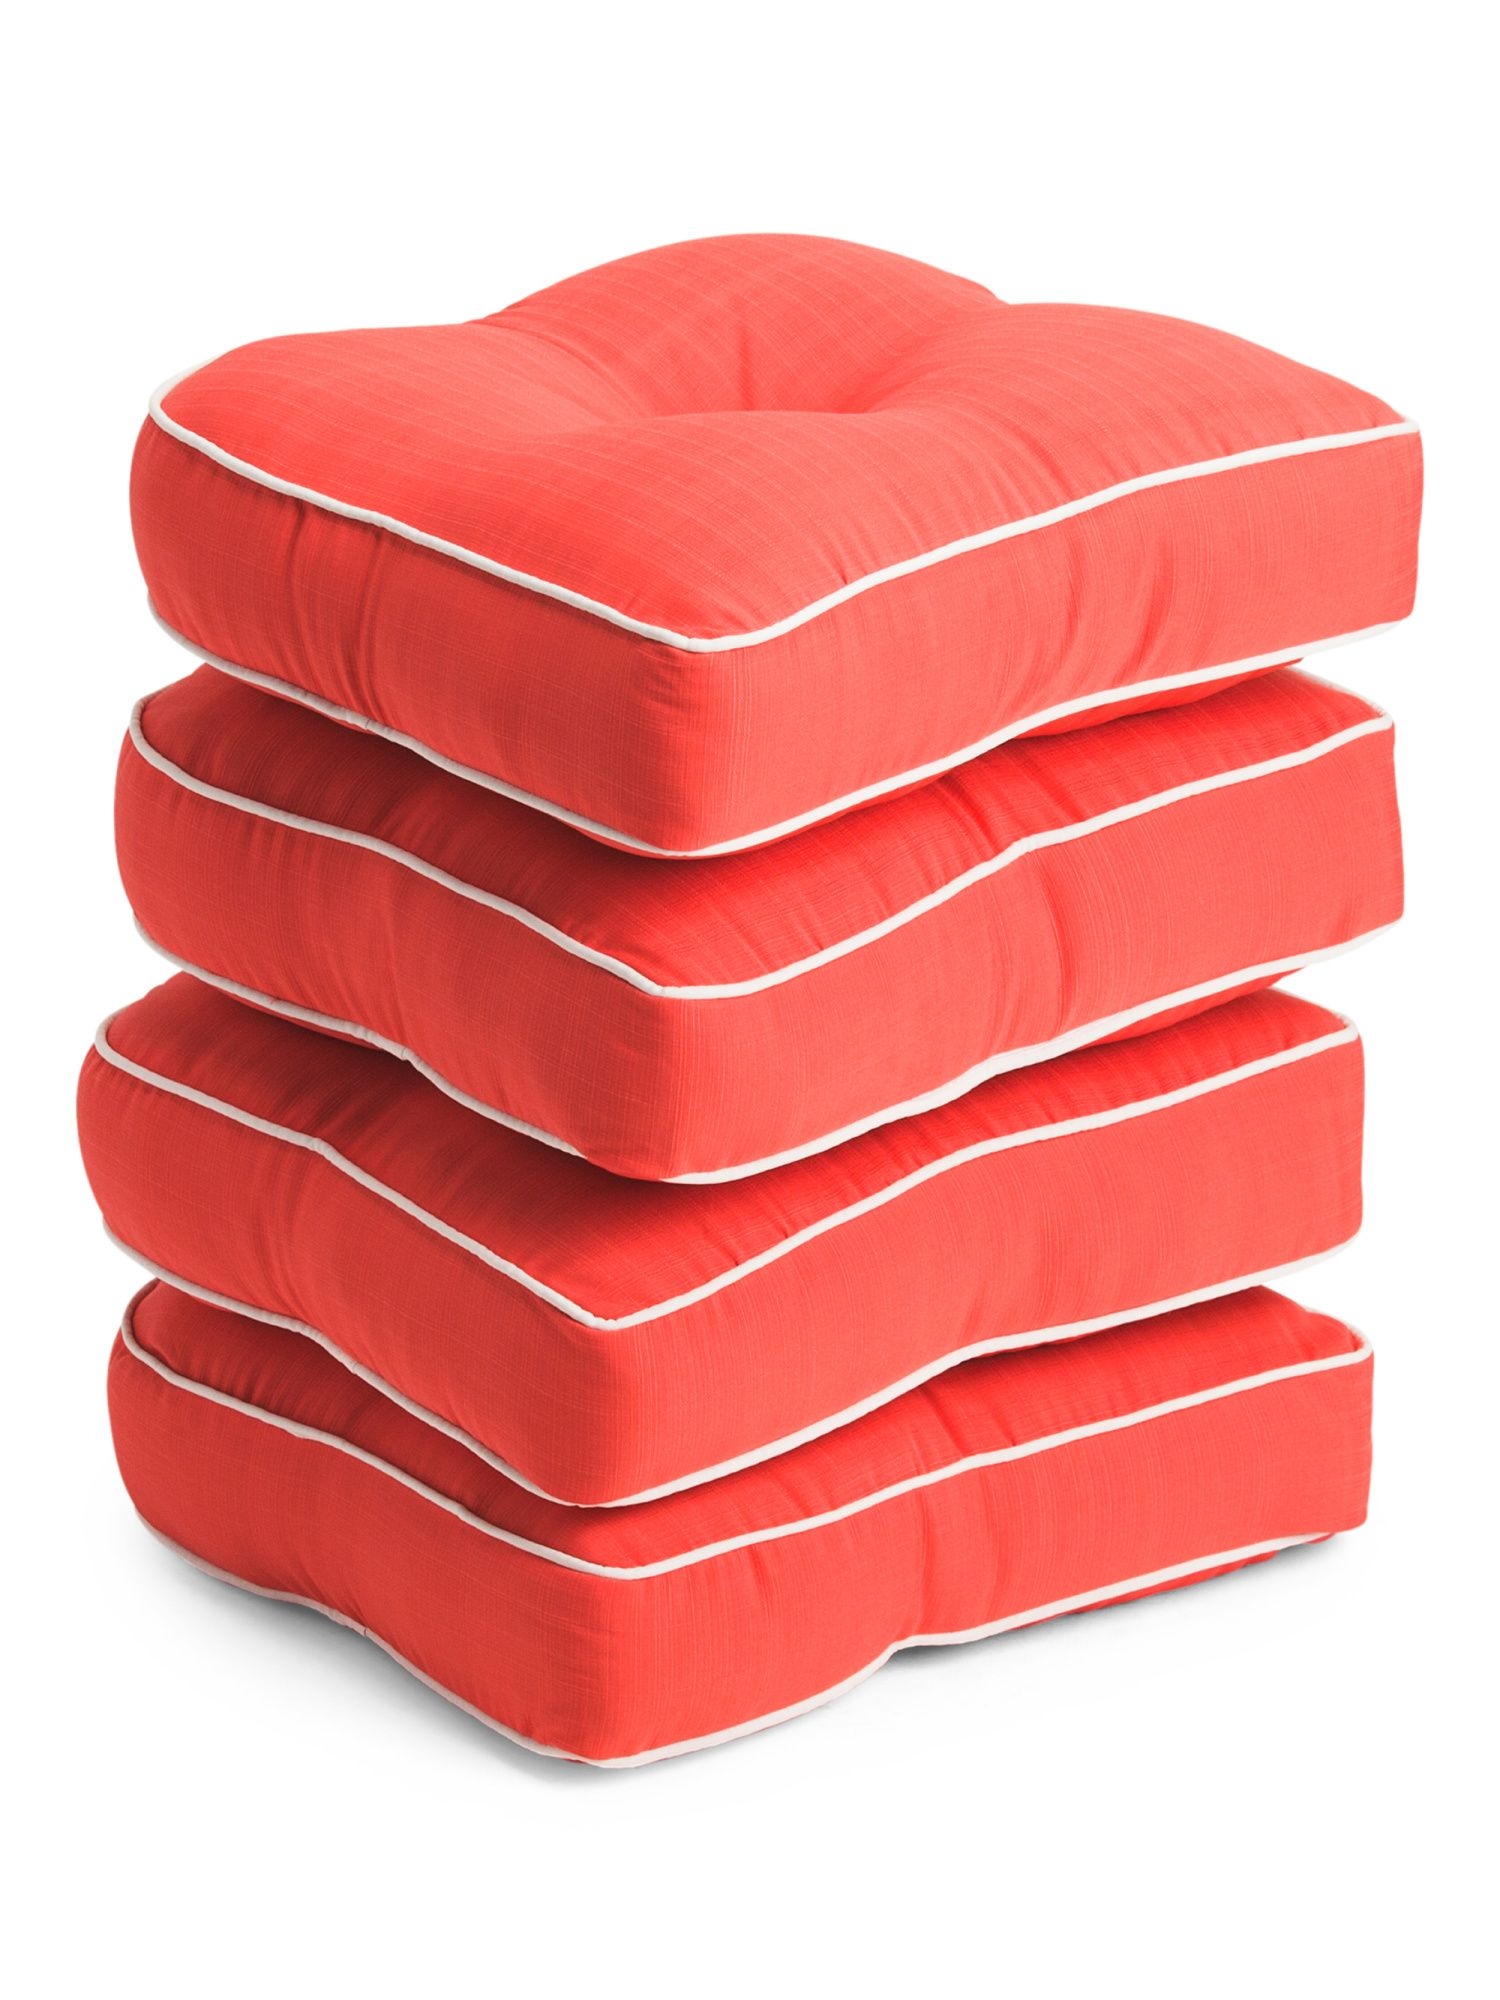 4pc Indoor Outdoor Cushion Set Throw Pillows T J Maxx Outdoor Cushions Indoor Outdoor Pool Indoor Outdoor